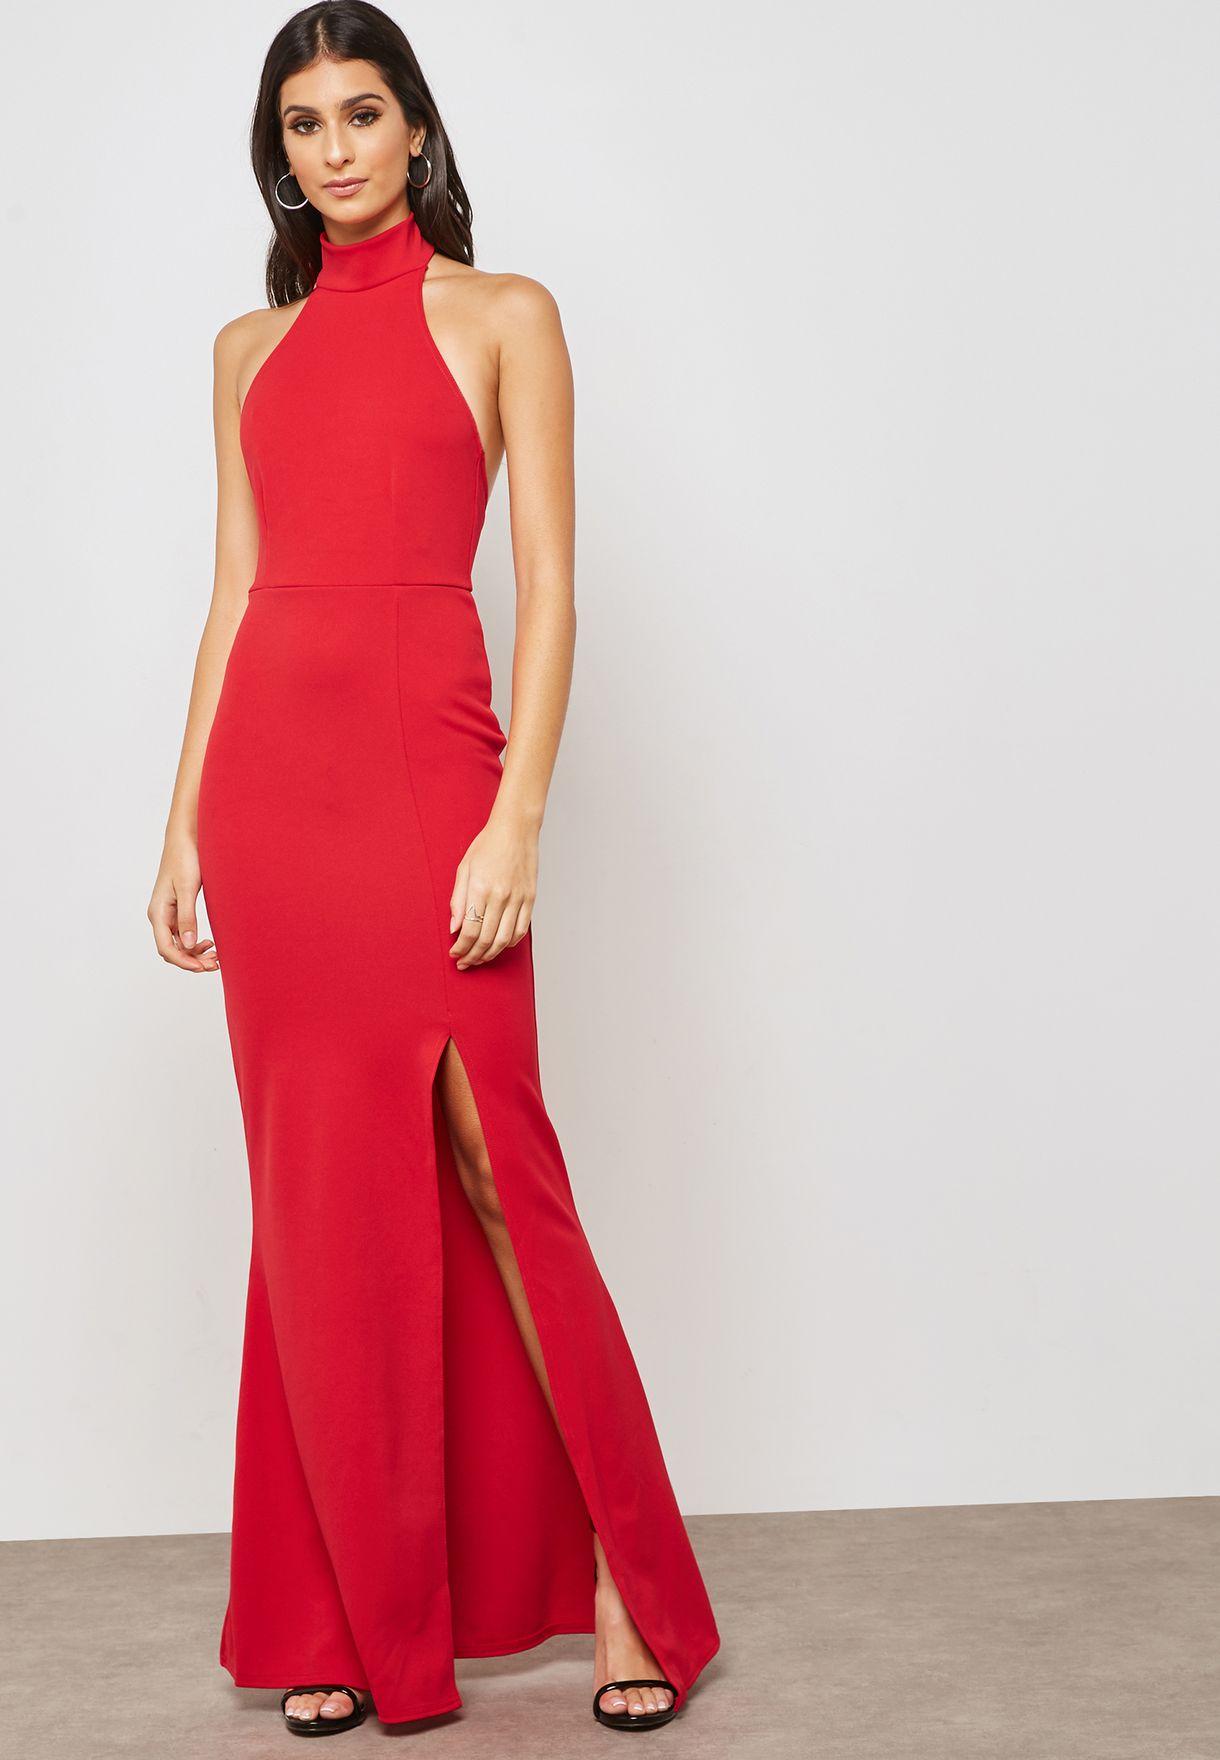 edca77d81 Shop Missguided red Halter Neck Maxi Dress DE904275 for Women in UAE ...